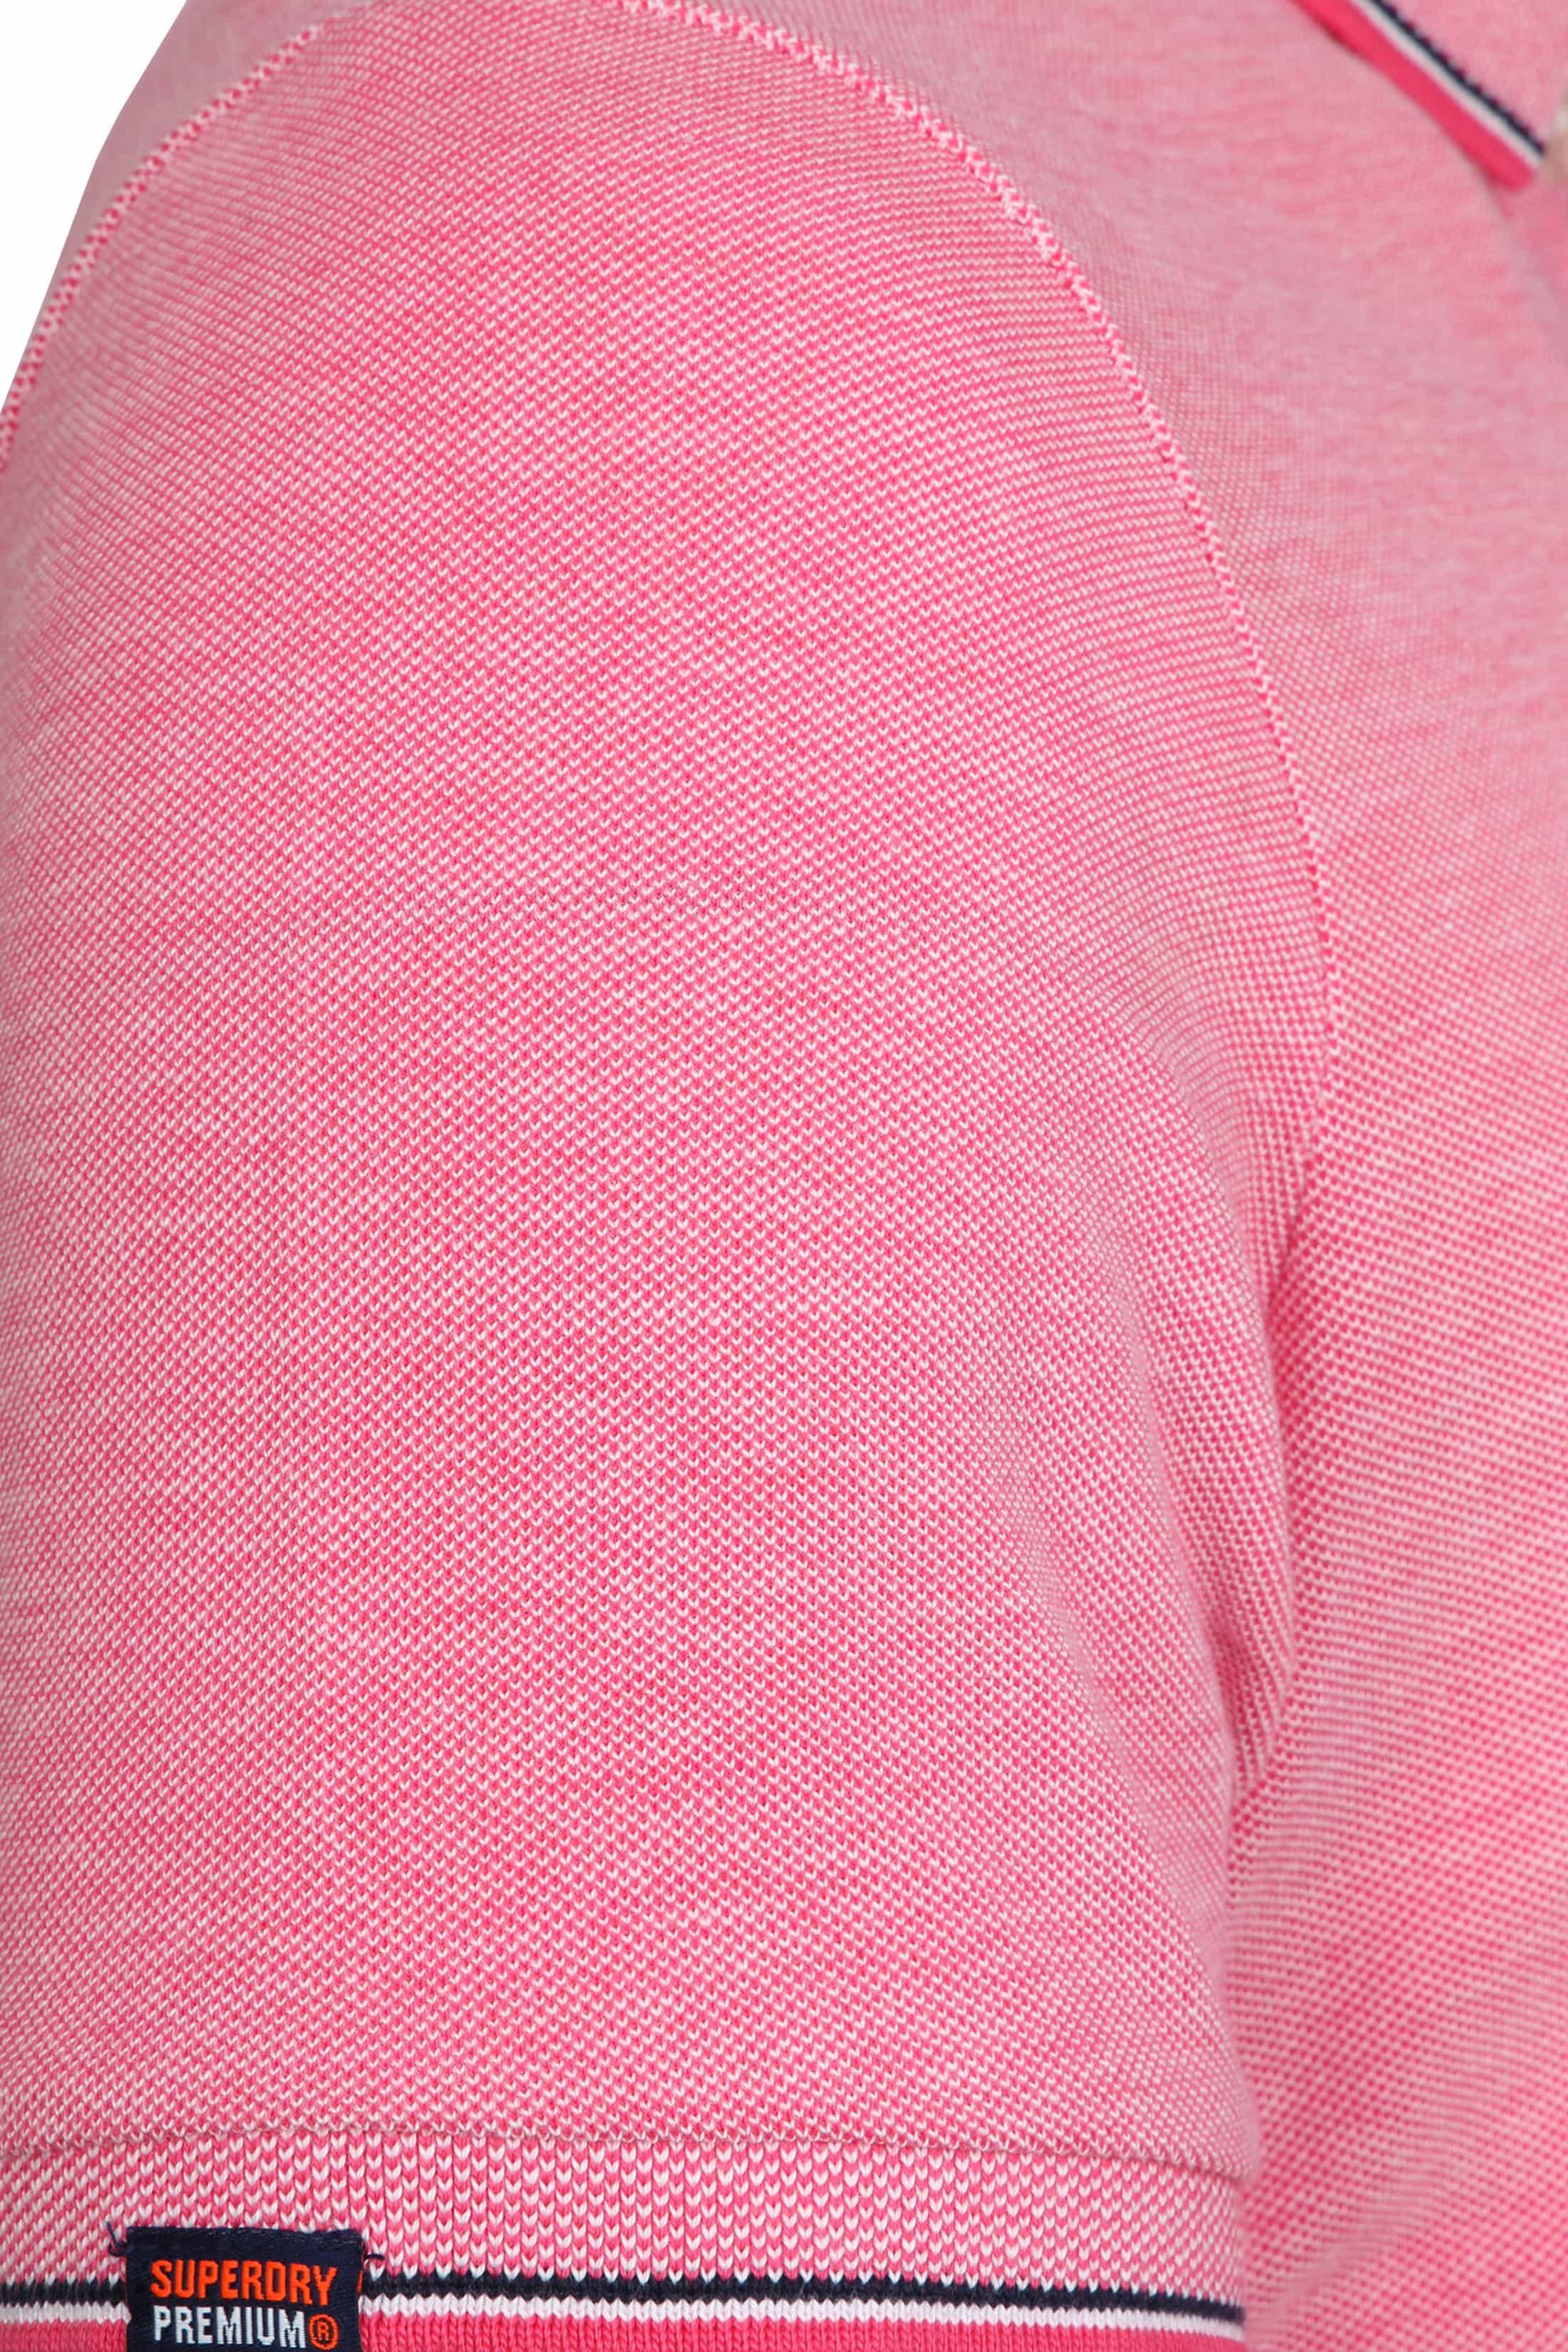 Superdry Premium Polo Pink foto 3